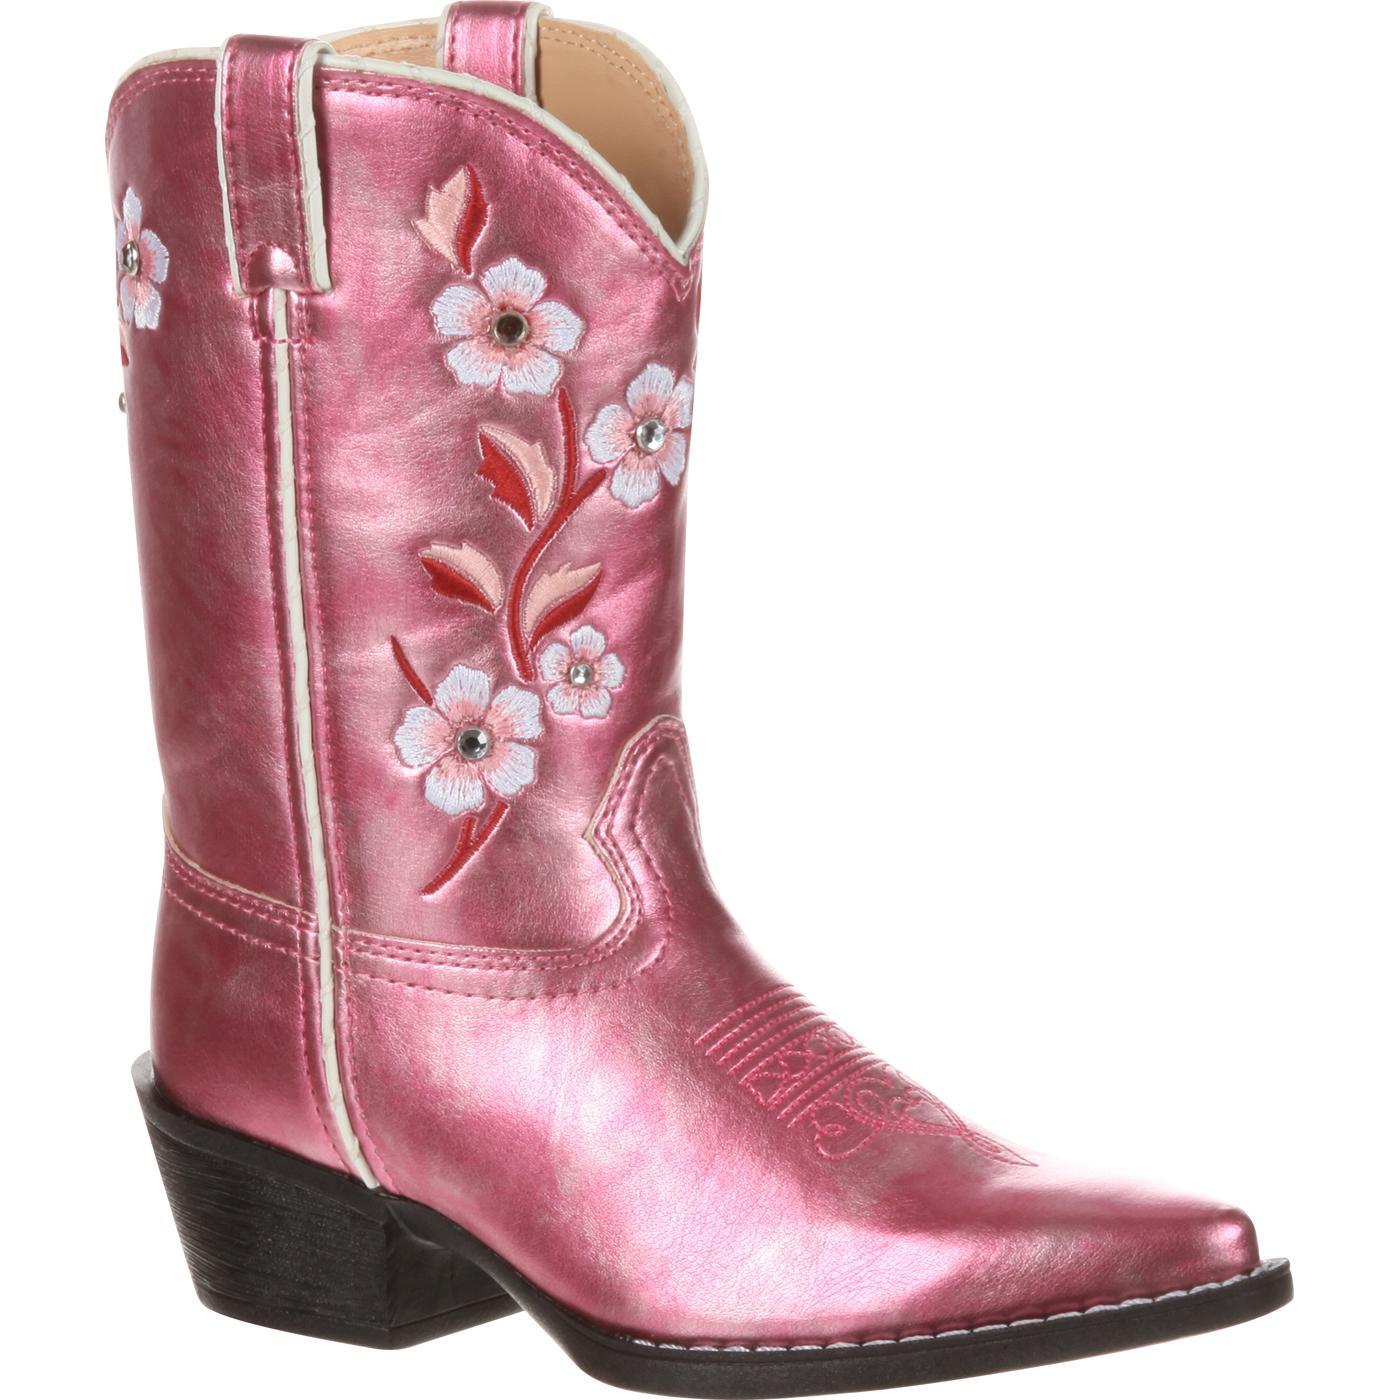 737de43548ac38 Lil  Durango Western Footwear -8